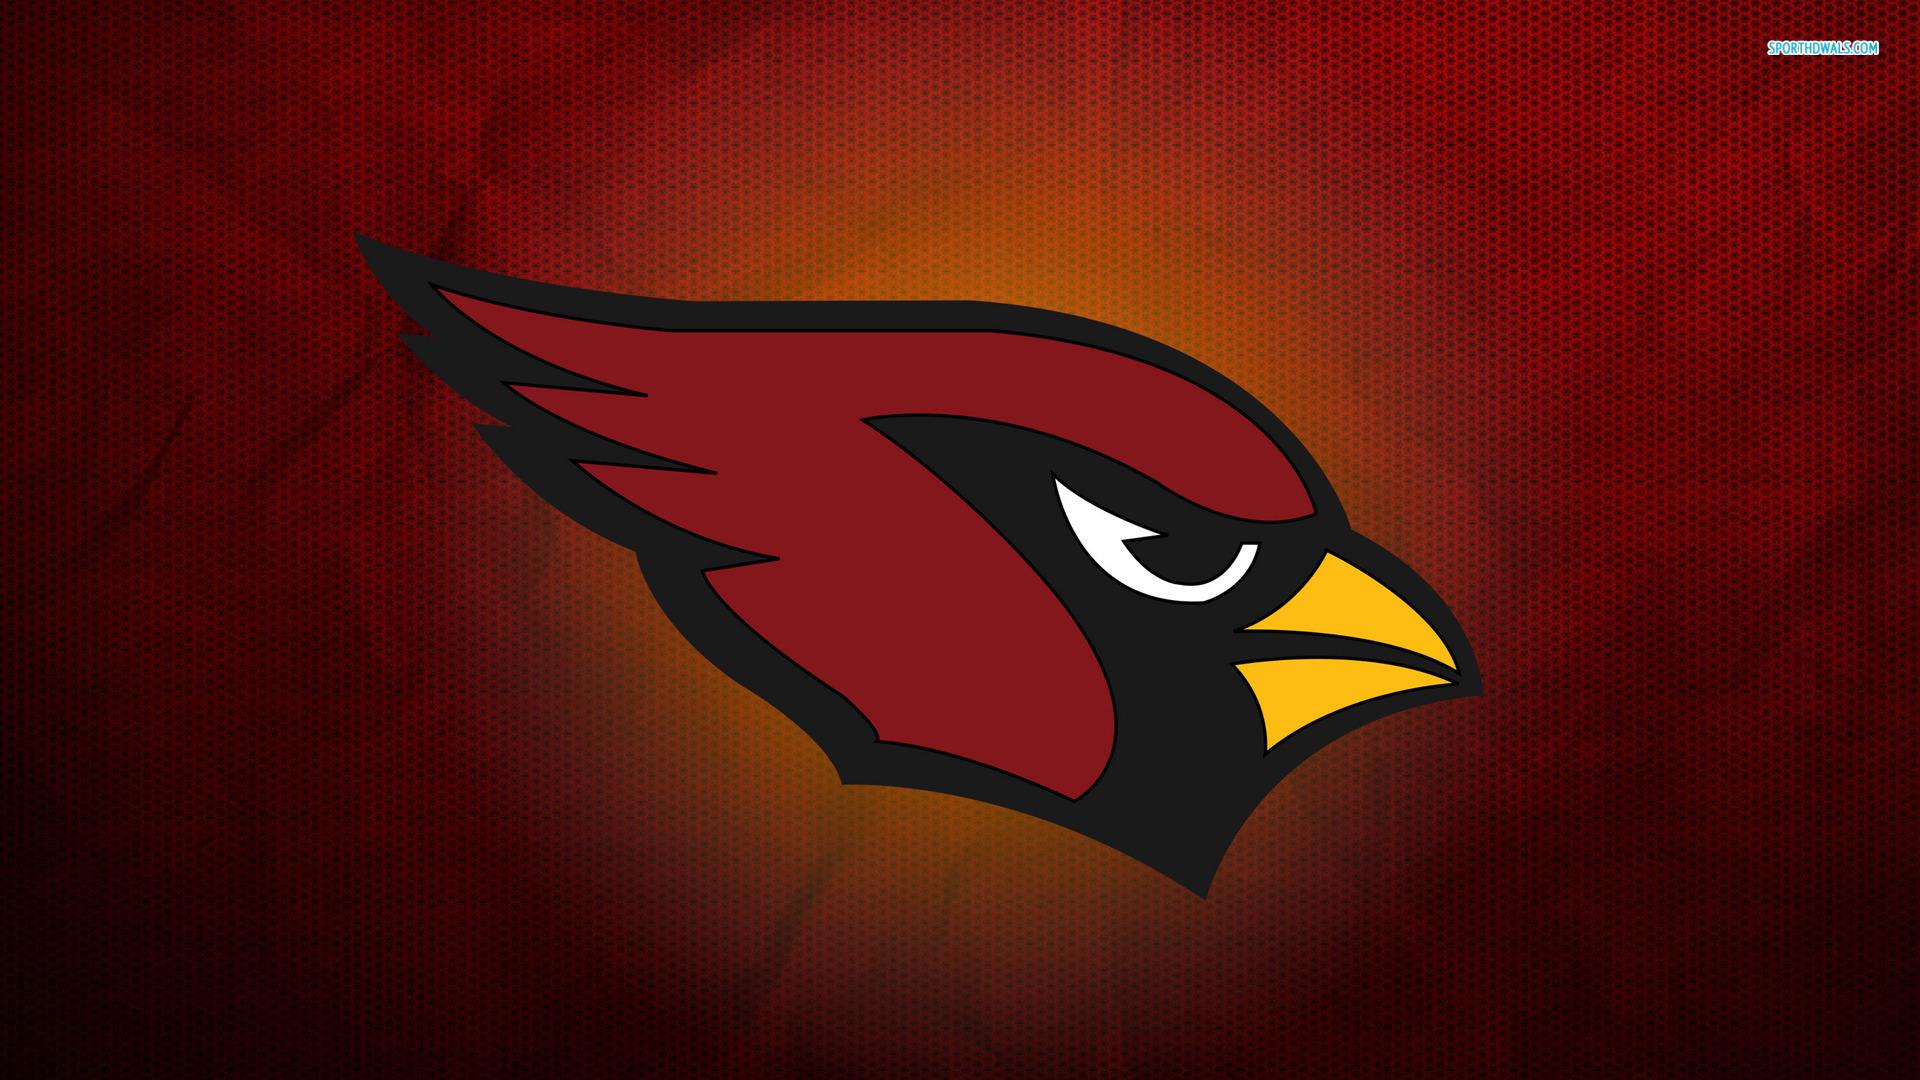 Cardinals Football Wallpaper